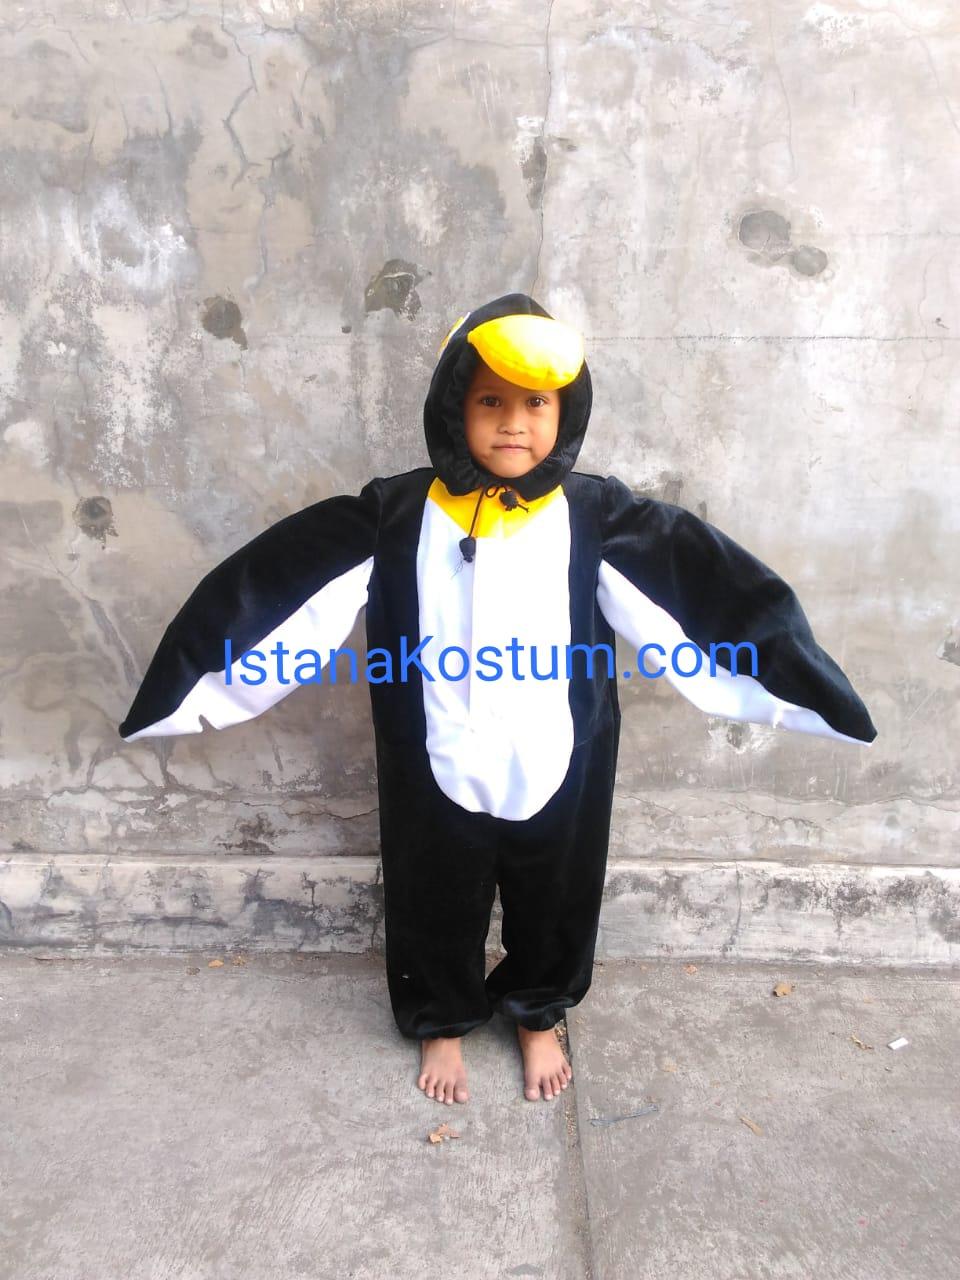 Produsen Kostum Badut Anak Karakter Penguin